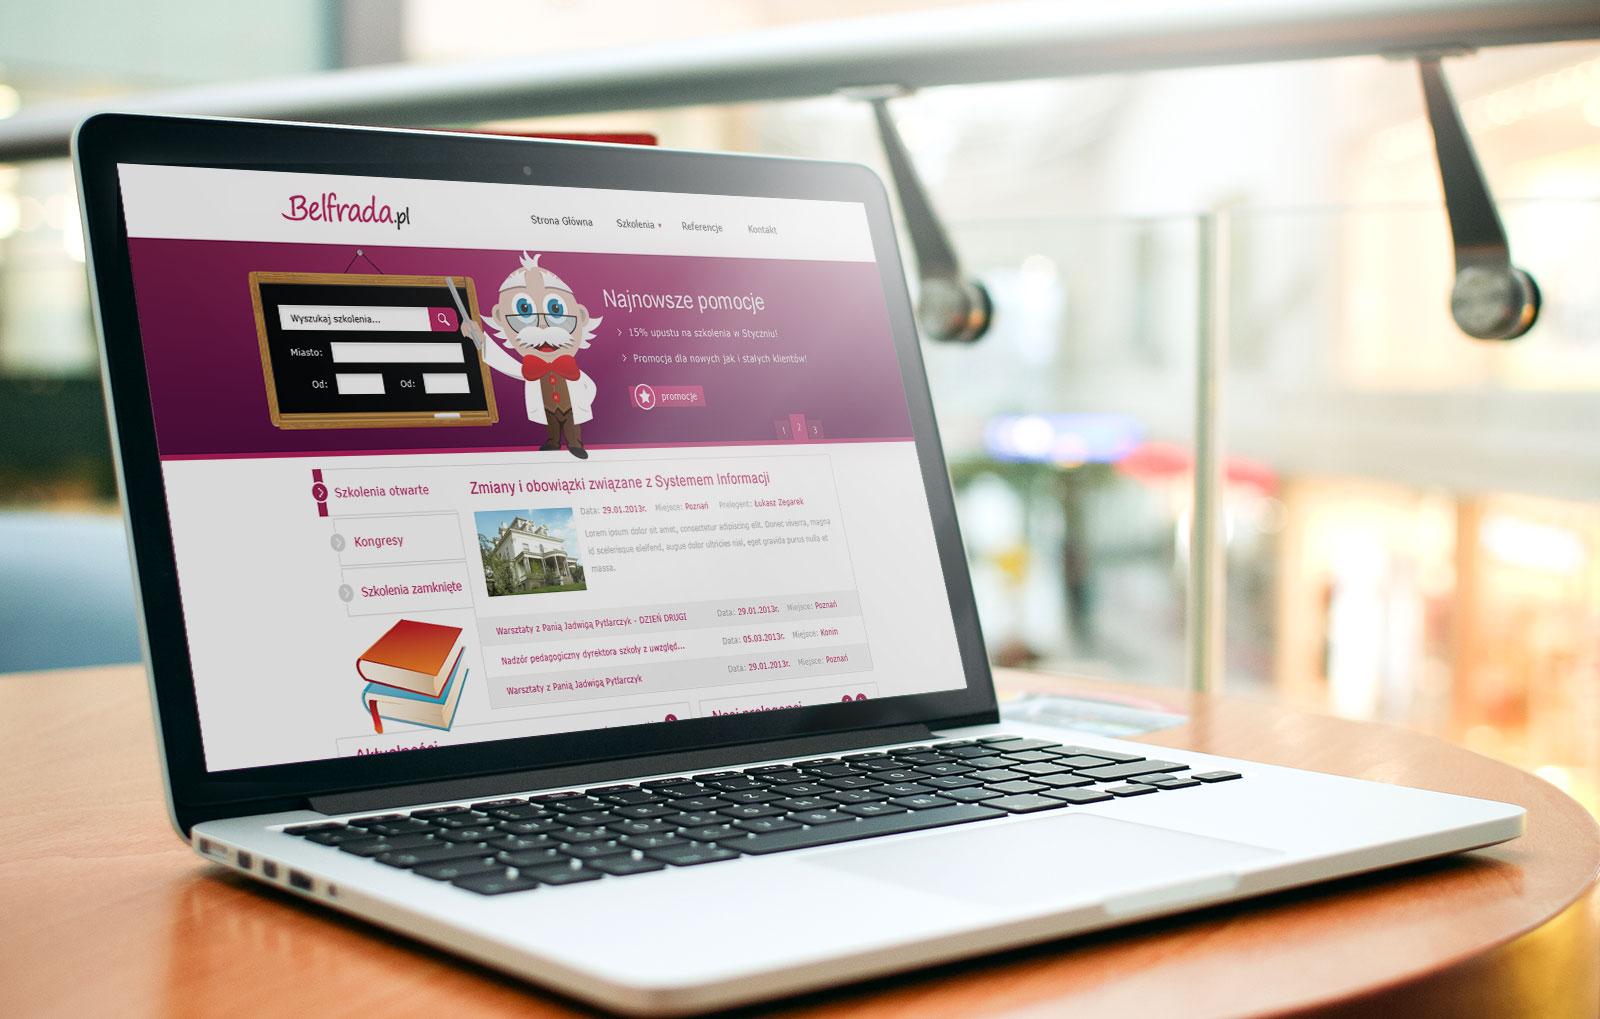 strona internetowa Belfrada